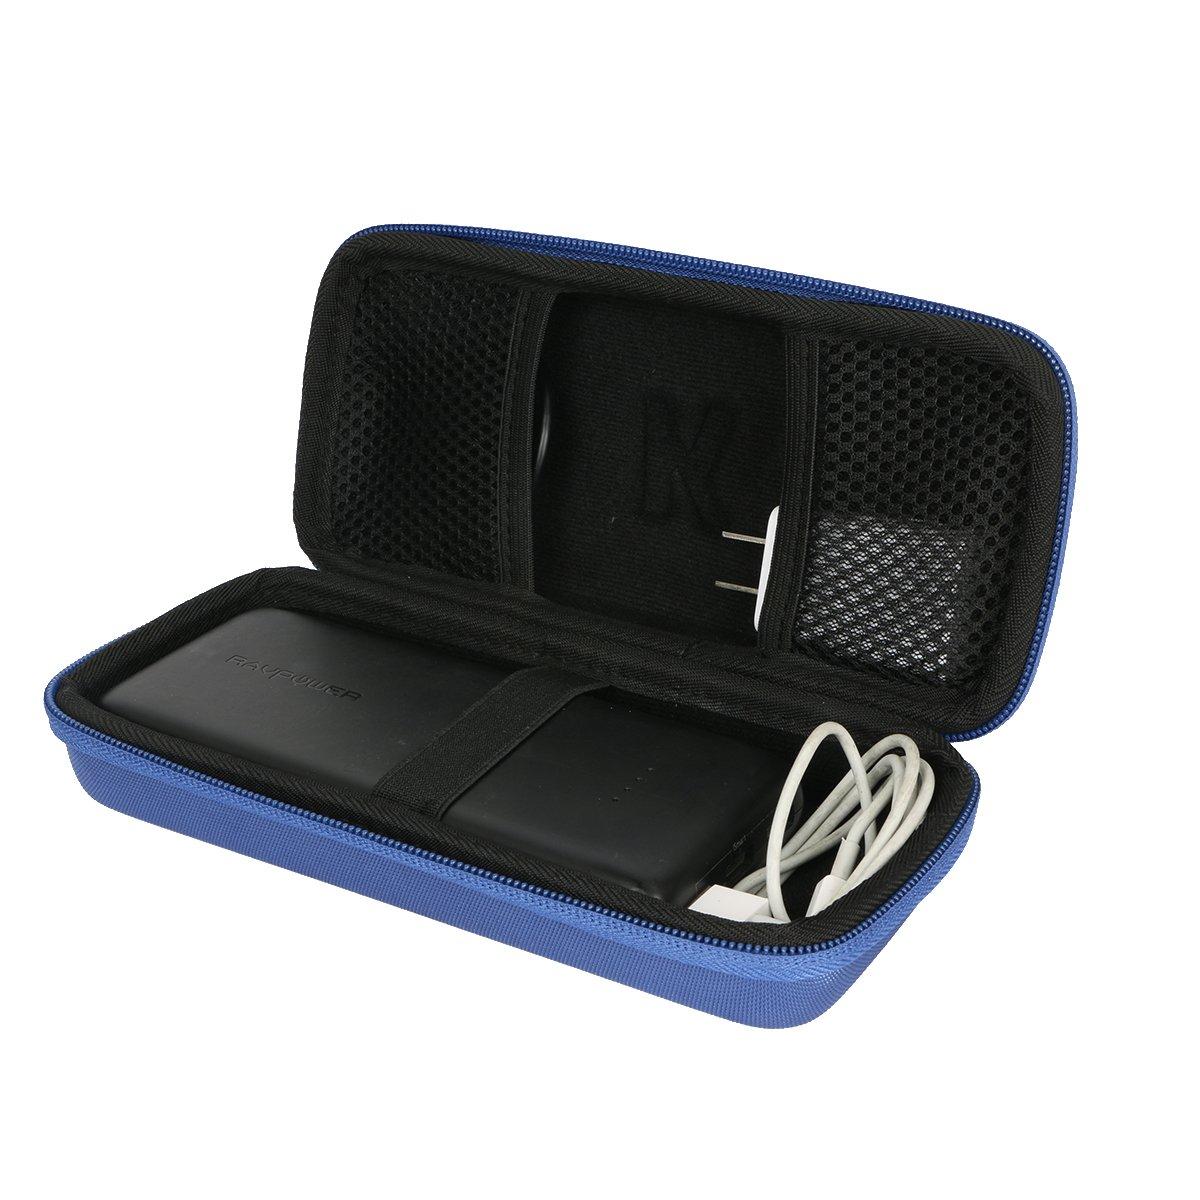 Khanka Hard Travel Case for RAVPower Portable Charger RAVPower 22000mAh Portable Phone Charger 22000 Power Bank 5.8A Output 3-Port Battery Packs (Blue)